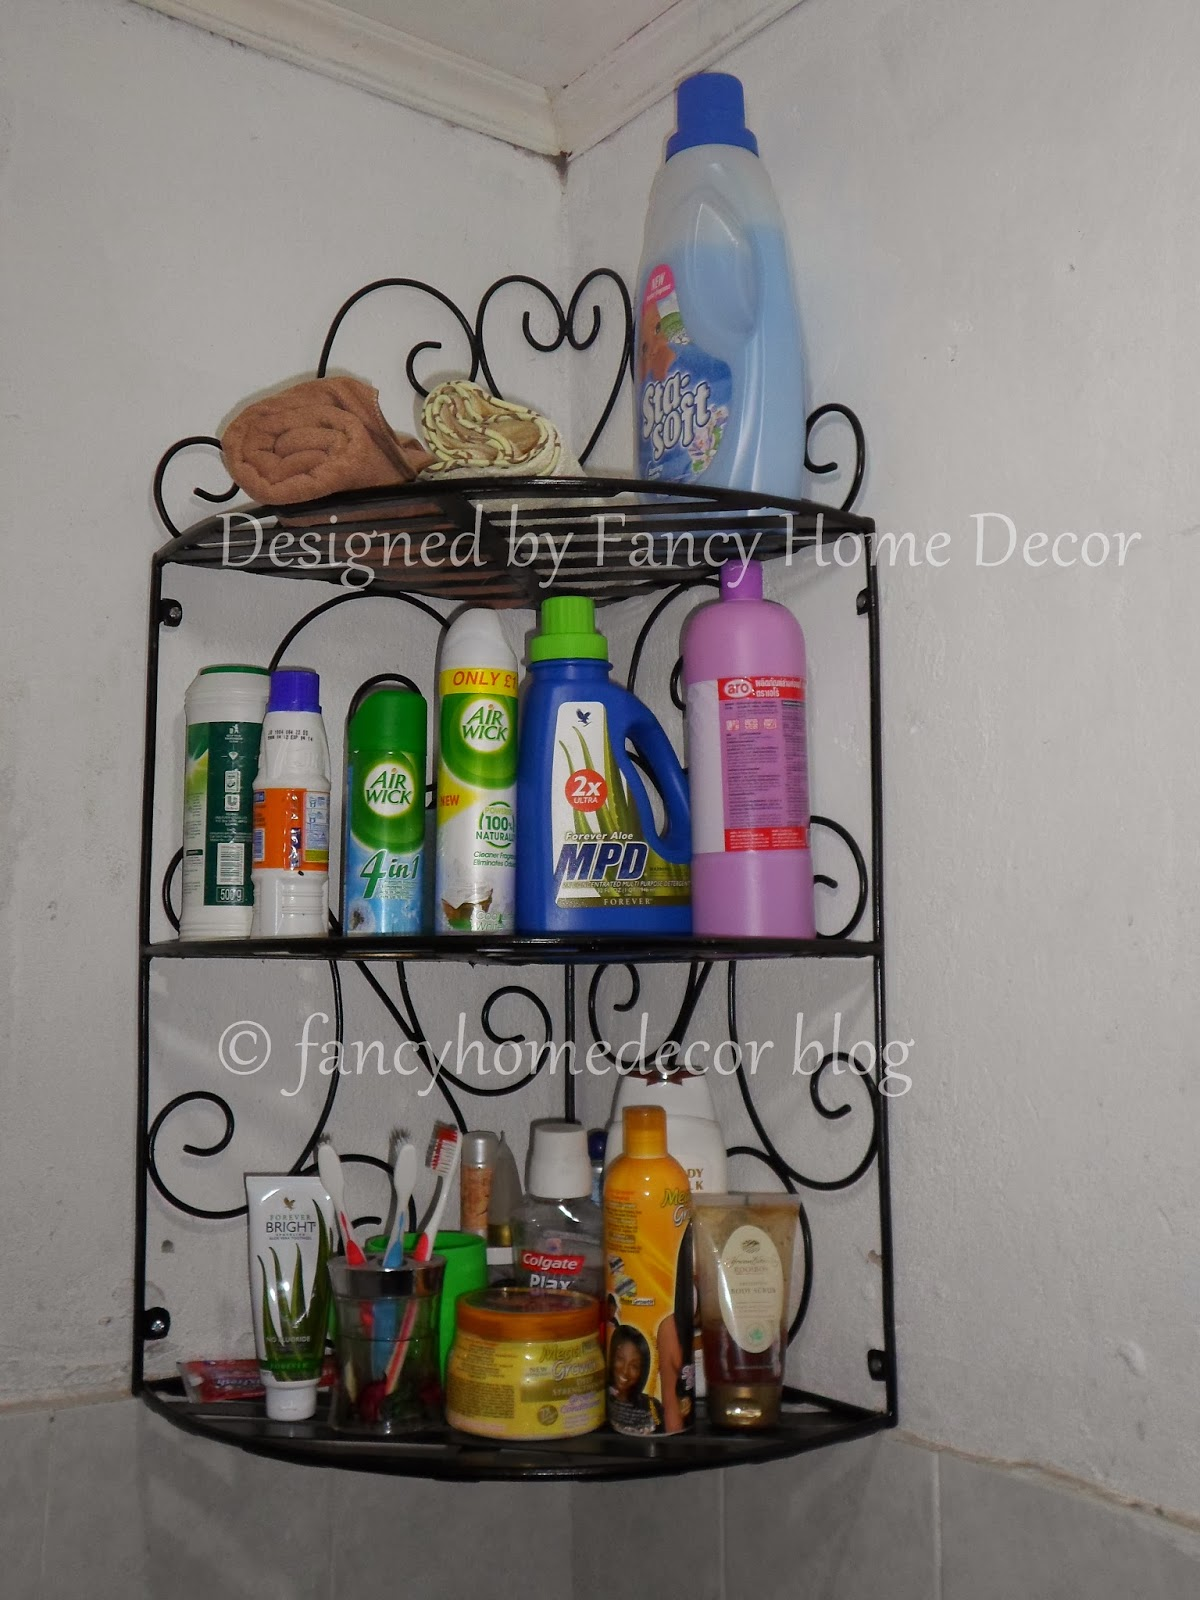 MY PROJECT: KITCHEN SHELVES, BATHROOM CORNER SHELF & CURTAIN HOLDBACKS